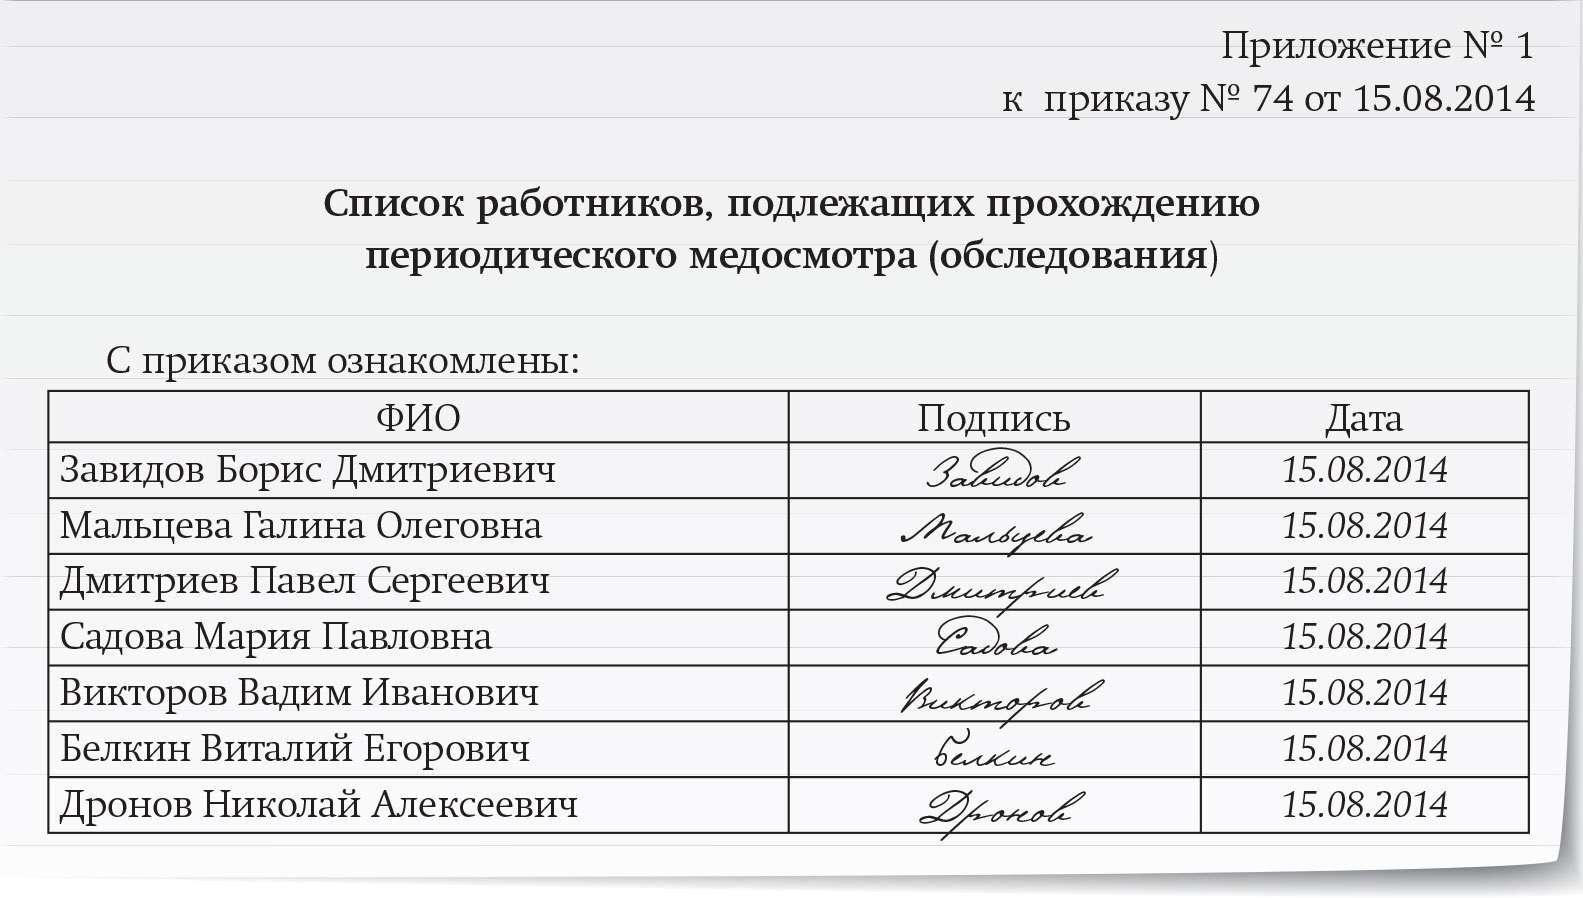 Образцы документов по охране труда на предприятии